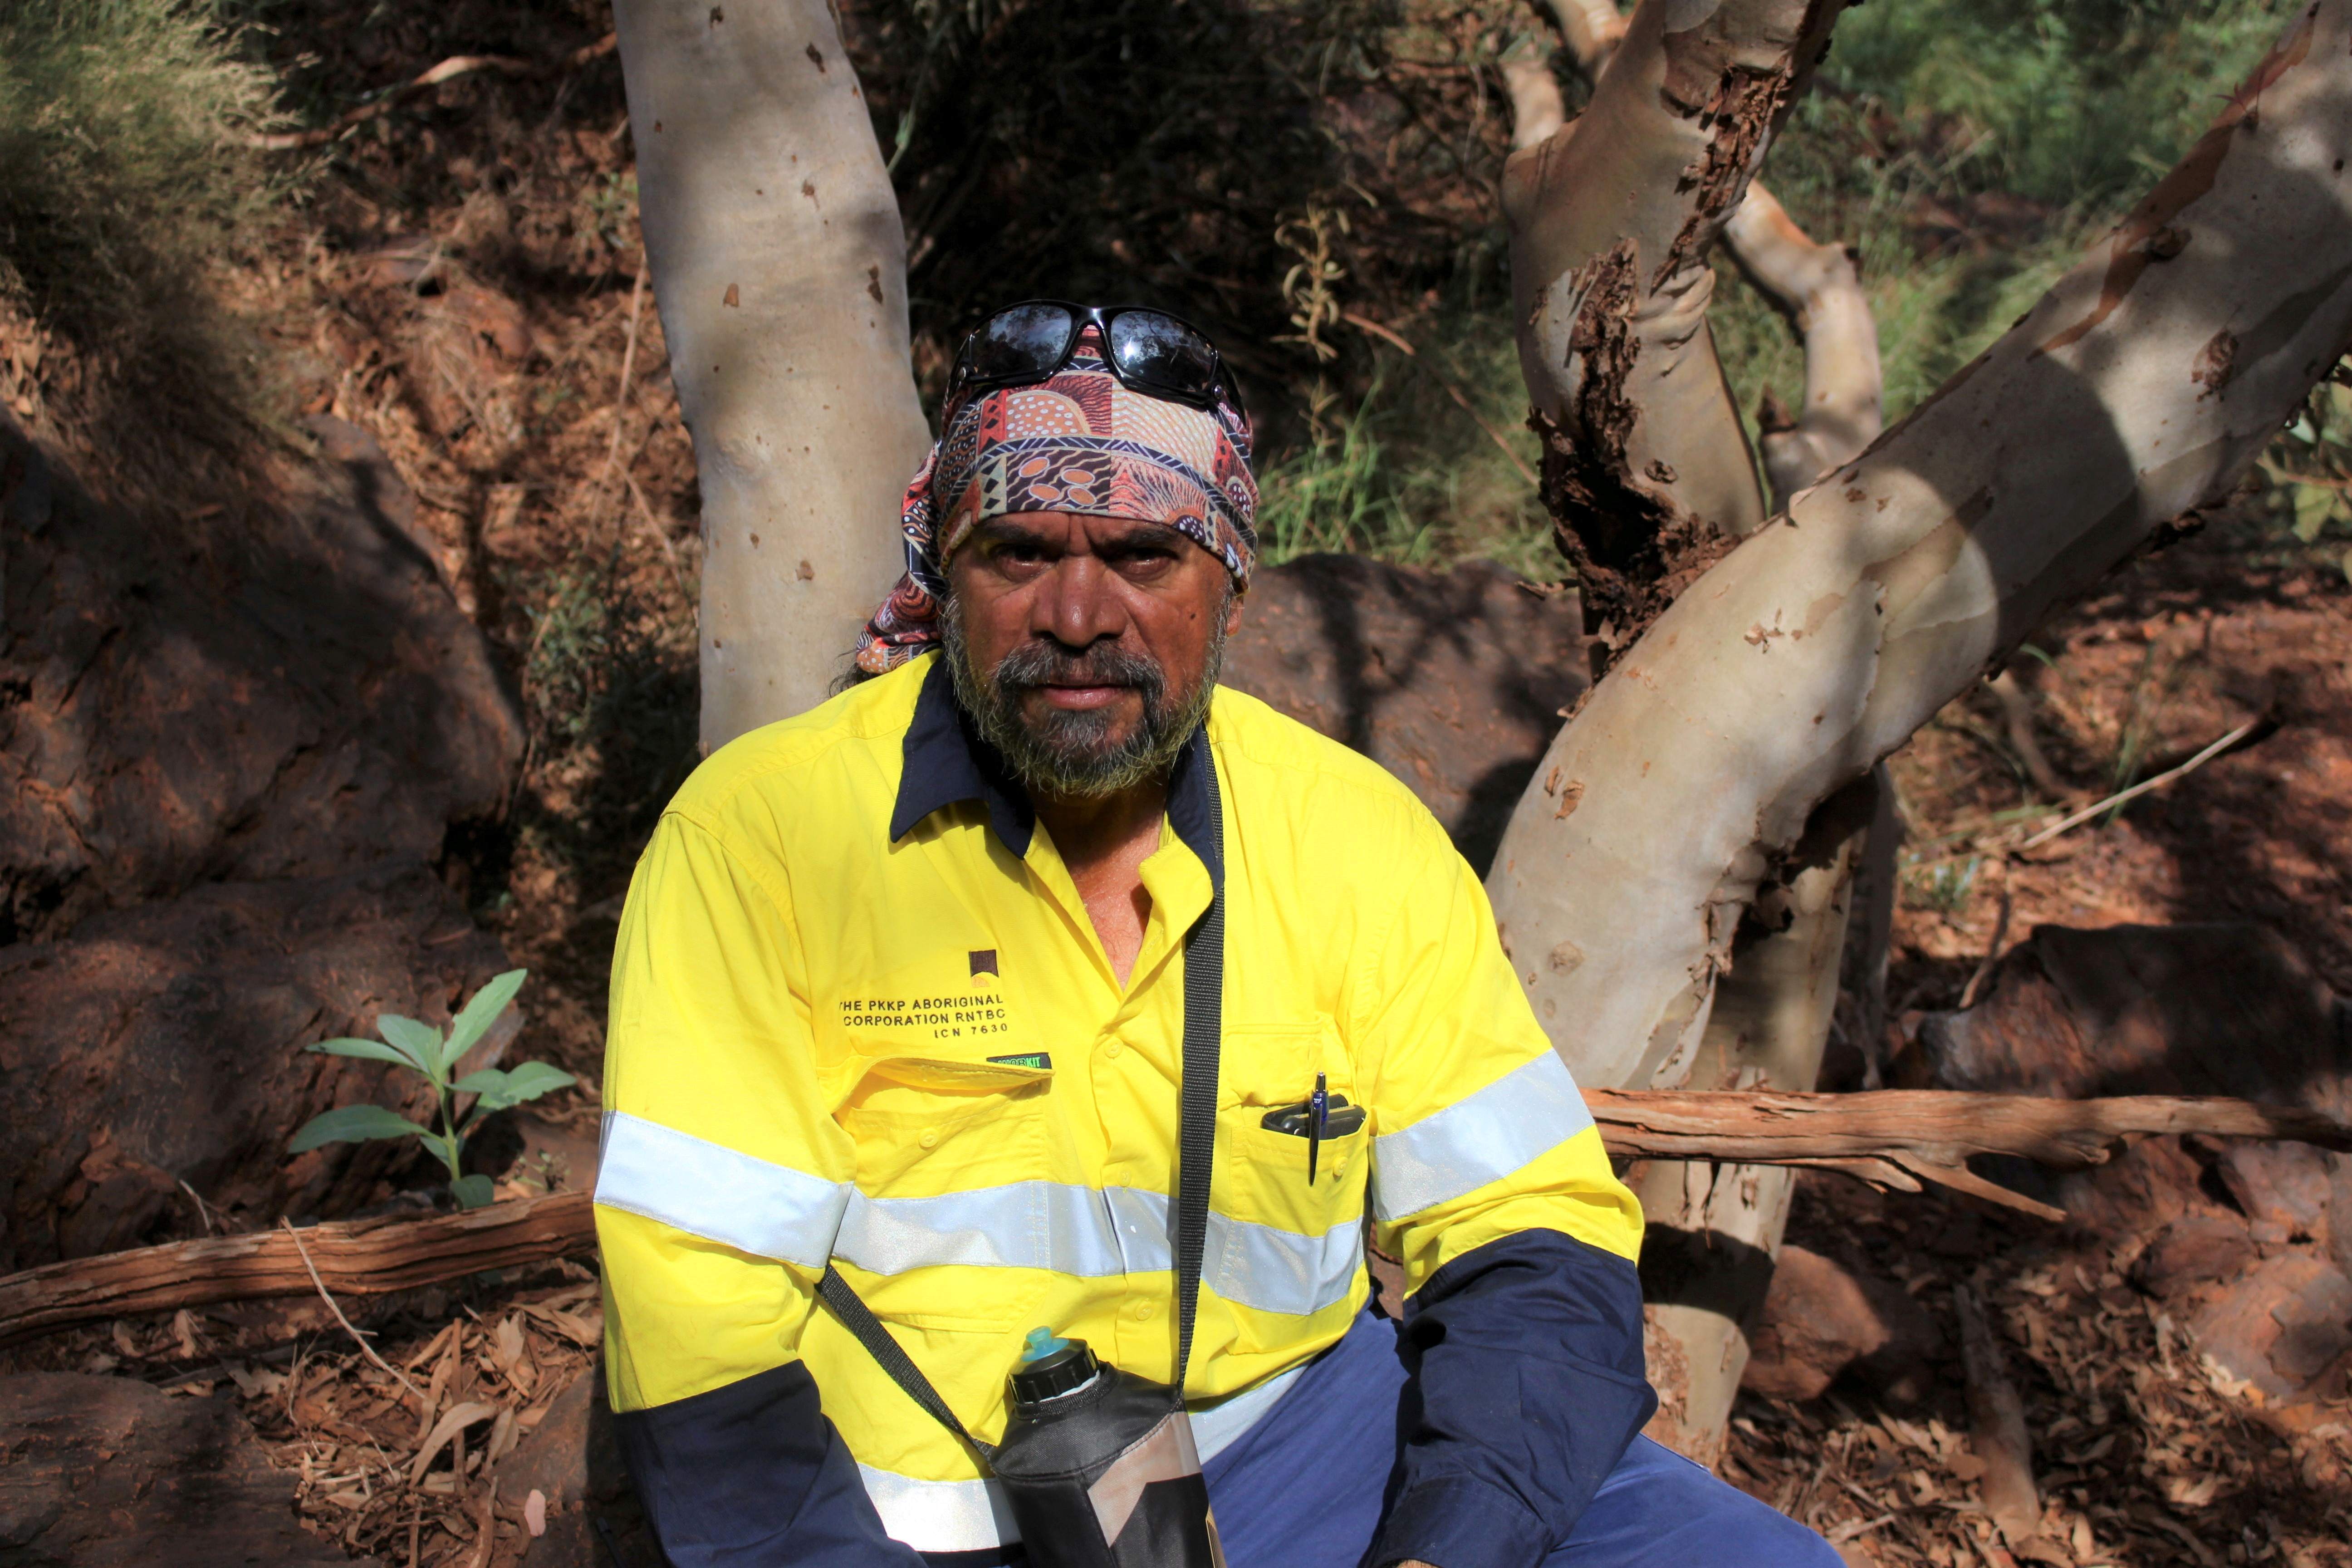 Puutu Kunti Kurrama and Pinikura (PKKP) Director and Puutu Kunti Kurruma Land Committee Chairperson Burchell Hayes poses in the Pilbara region of Western Australia, May 10, 2021.   Puutu Kunti Kurrama and Pinikura (PKKP)/Handout via REUTERS